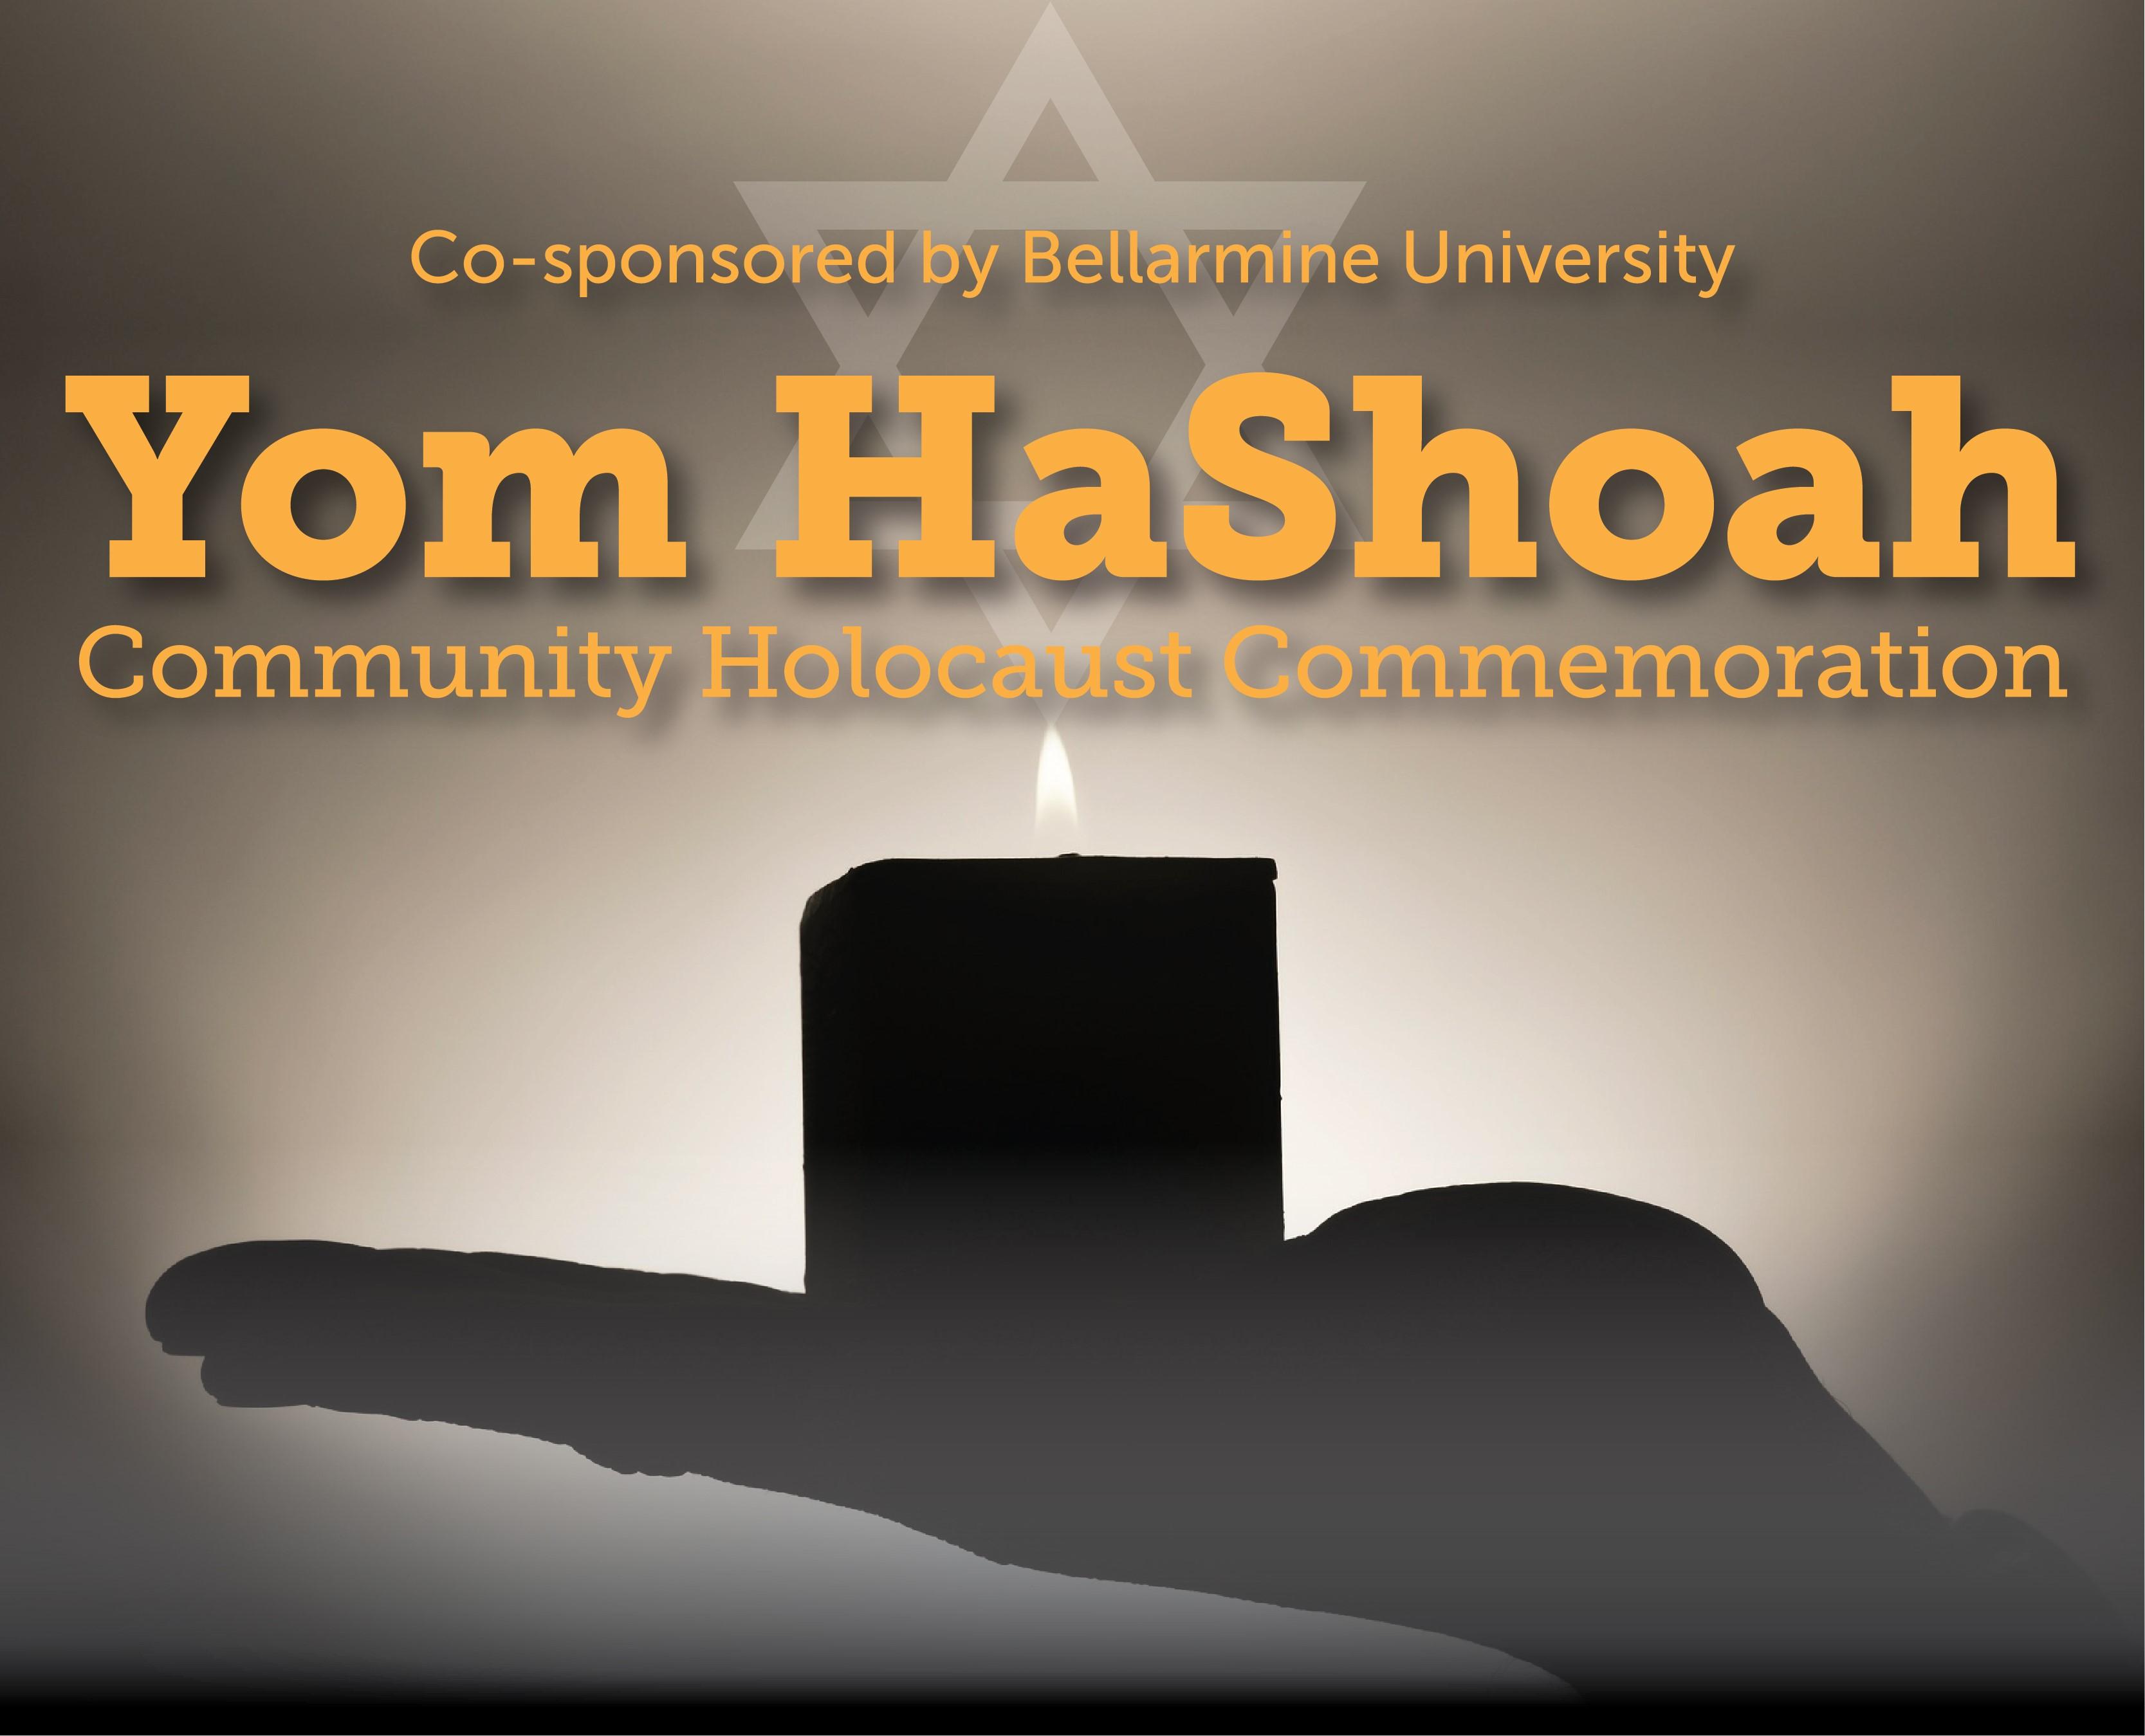 Yom HaShoah: Community Holocaust Commemoration